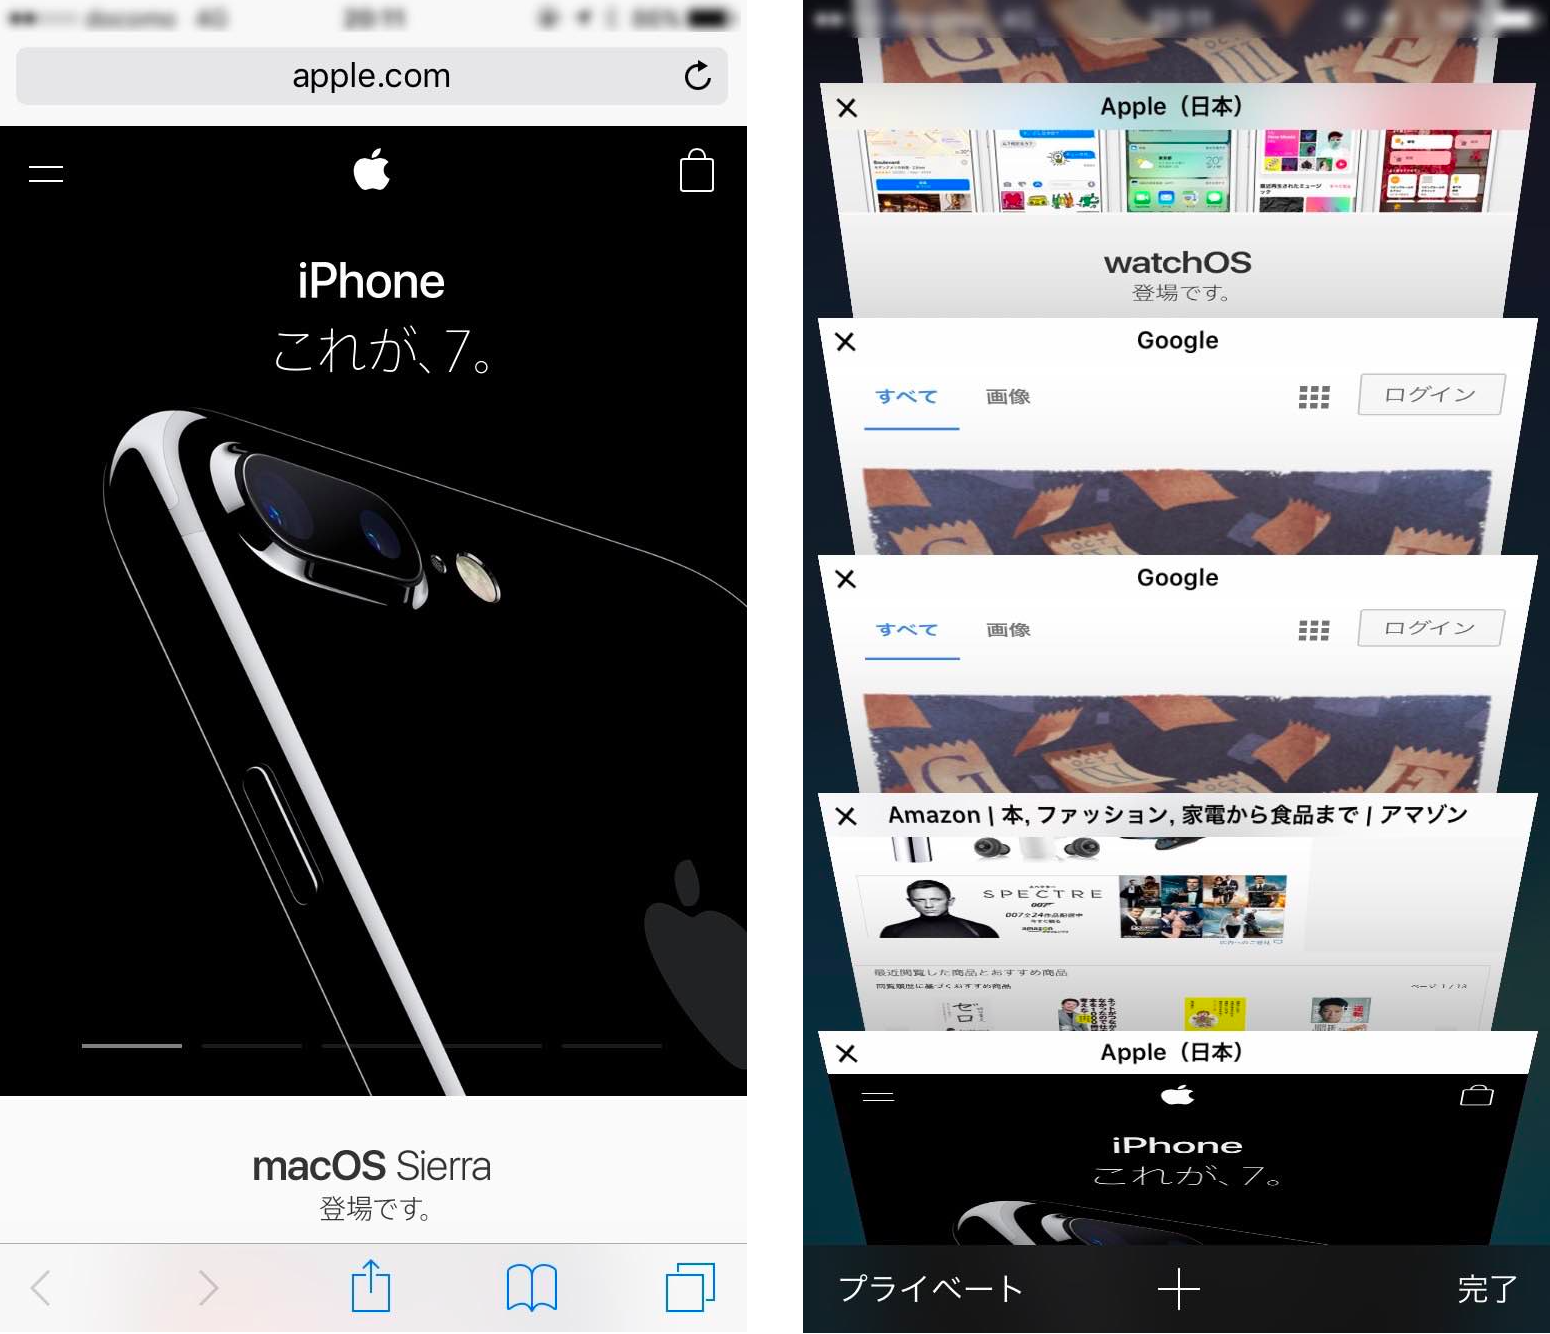 【iOS】iPhoneやiPadのSafariで開いた複数のタブをまとめて閉じる方法